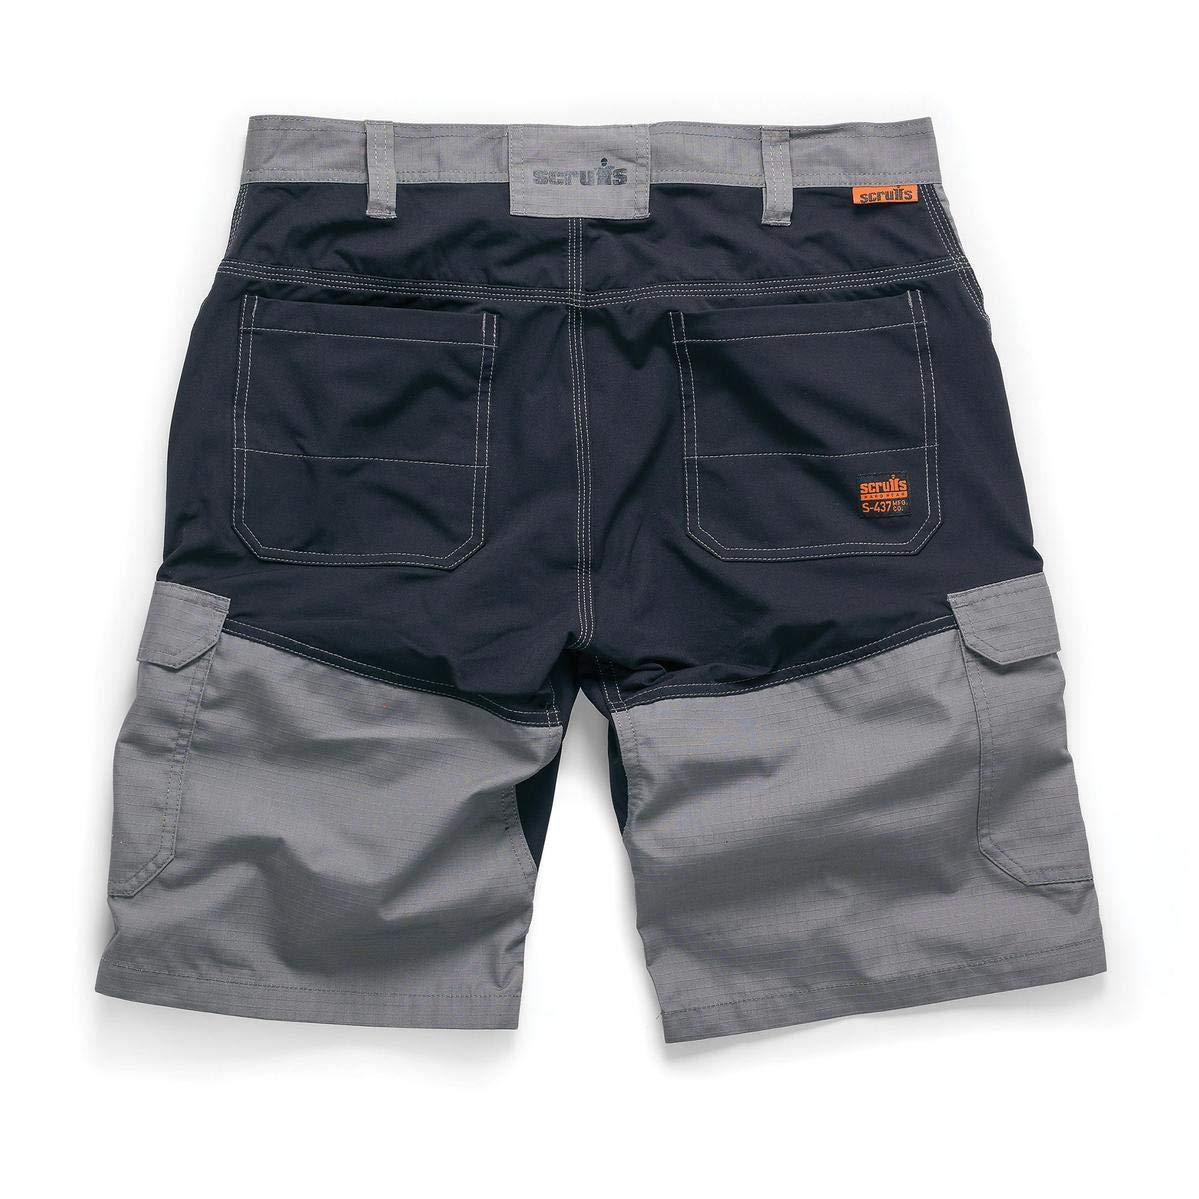 Scruffs T54651 Trade Flex Holster Shorts Graphite 34W